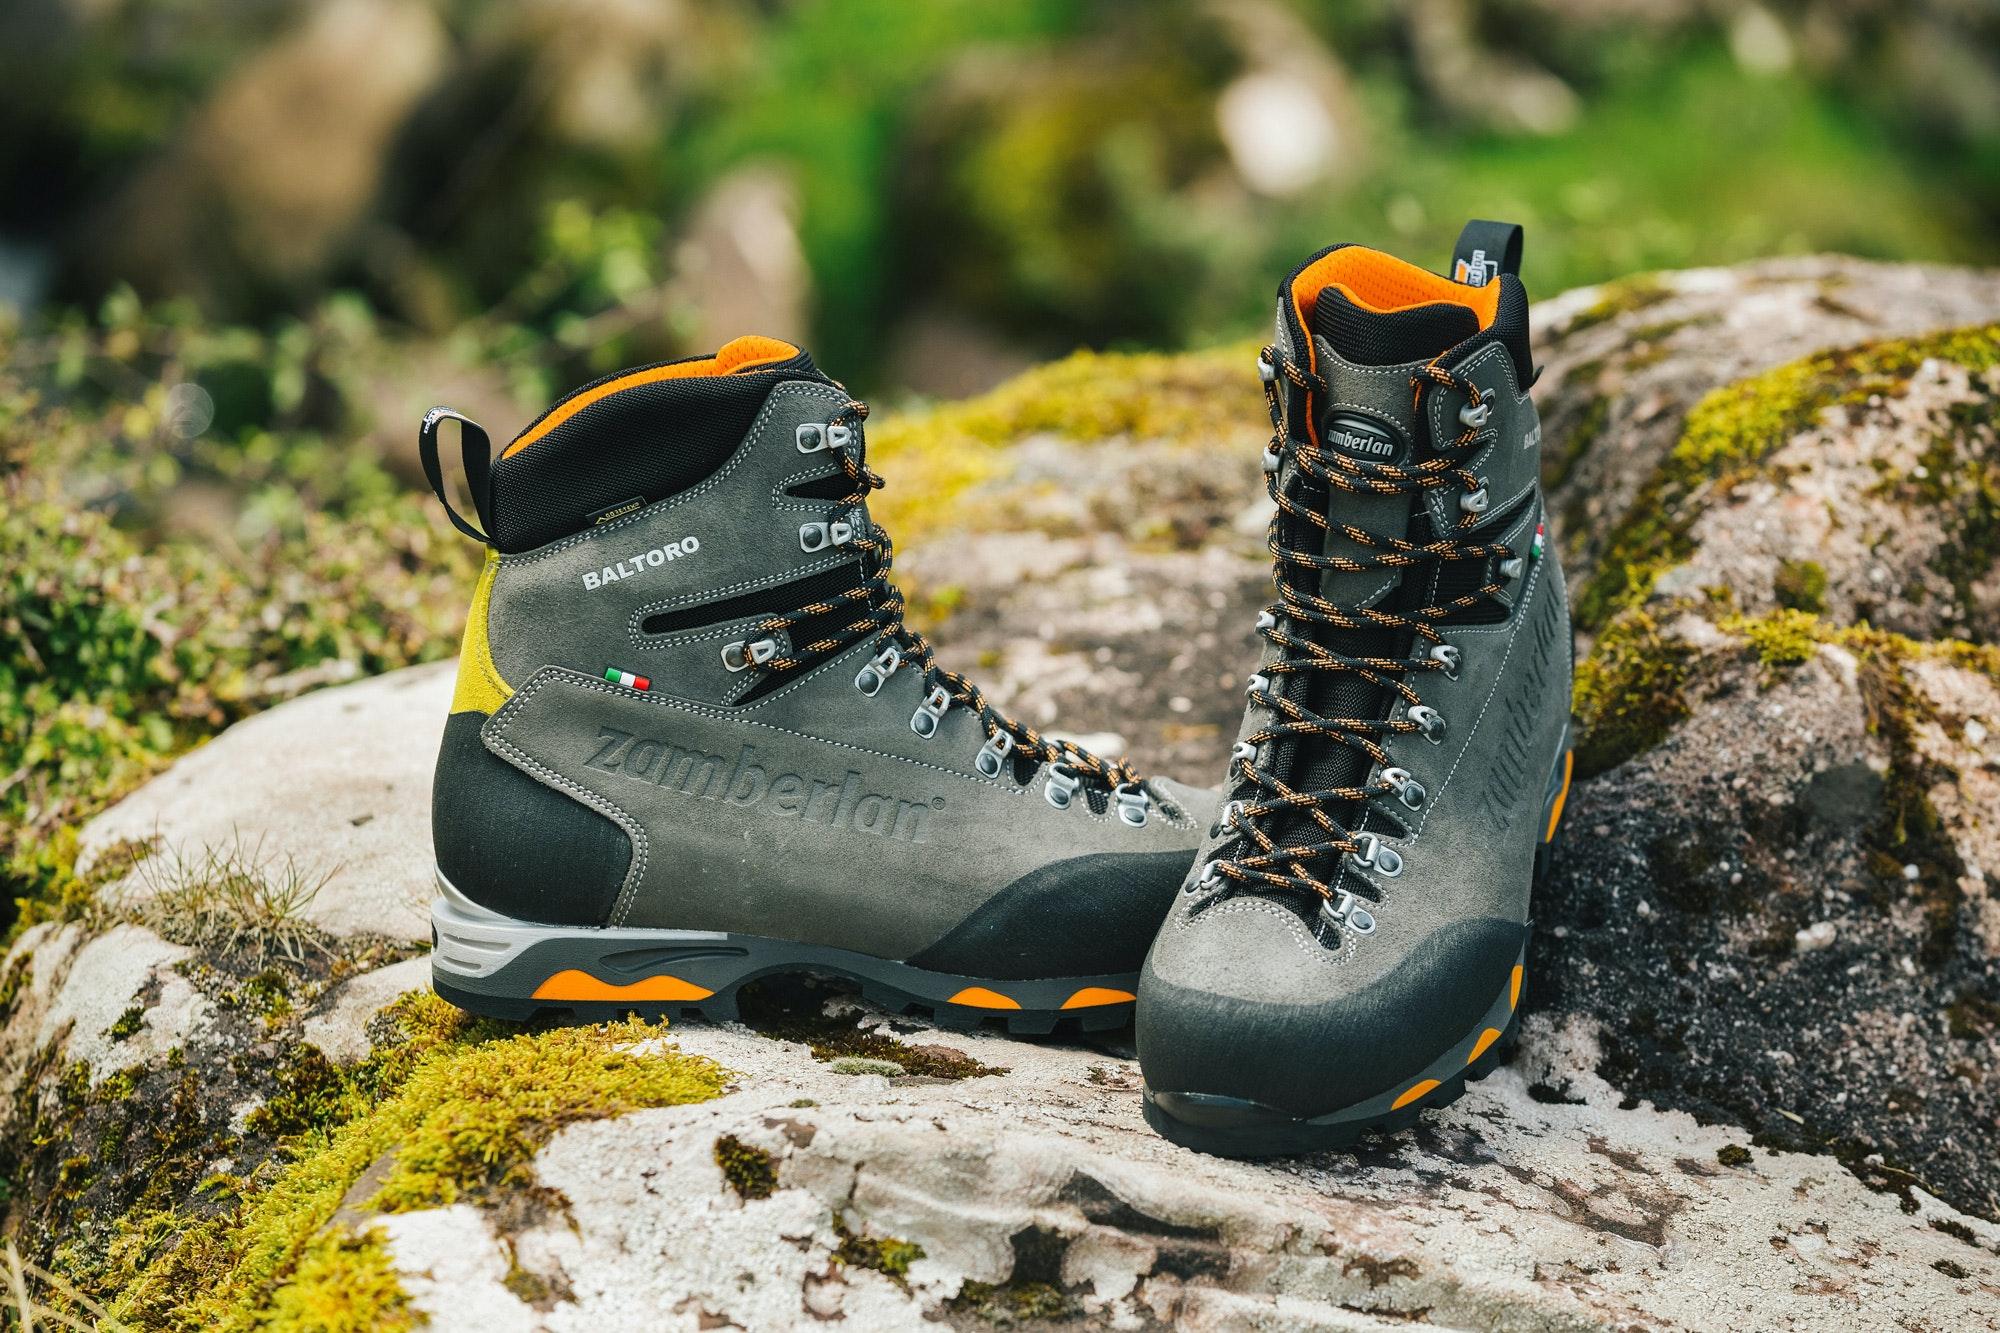 Zamberlan 1000 Baltoro Gtx Walking Boots Review